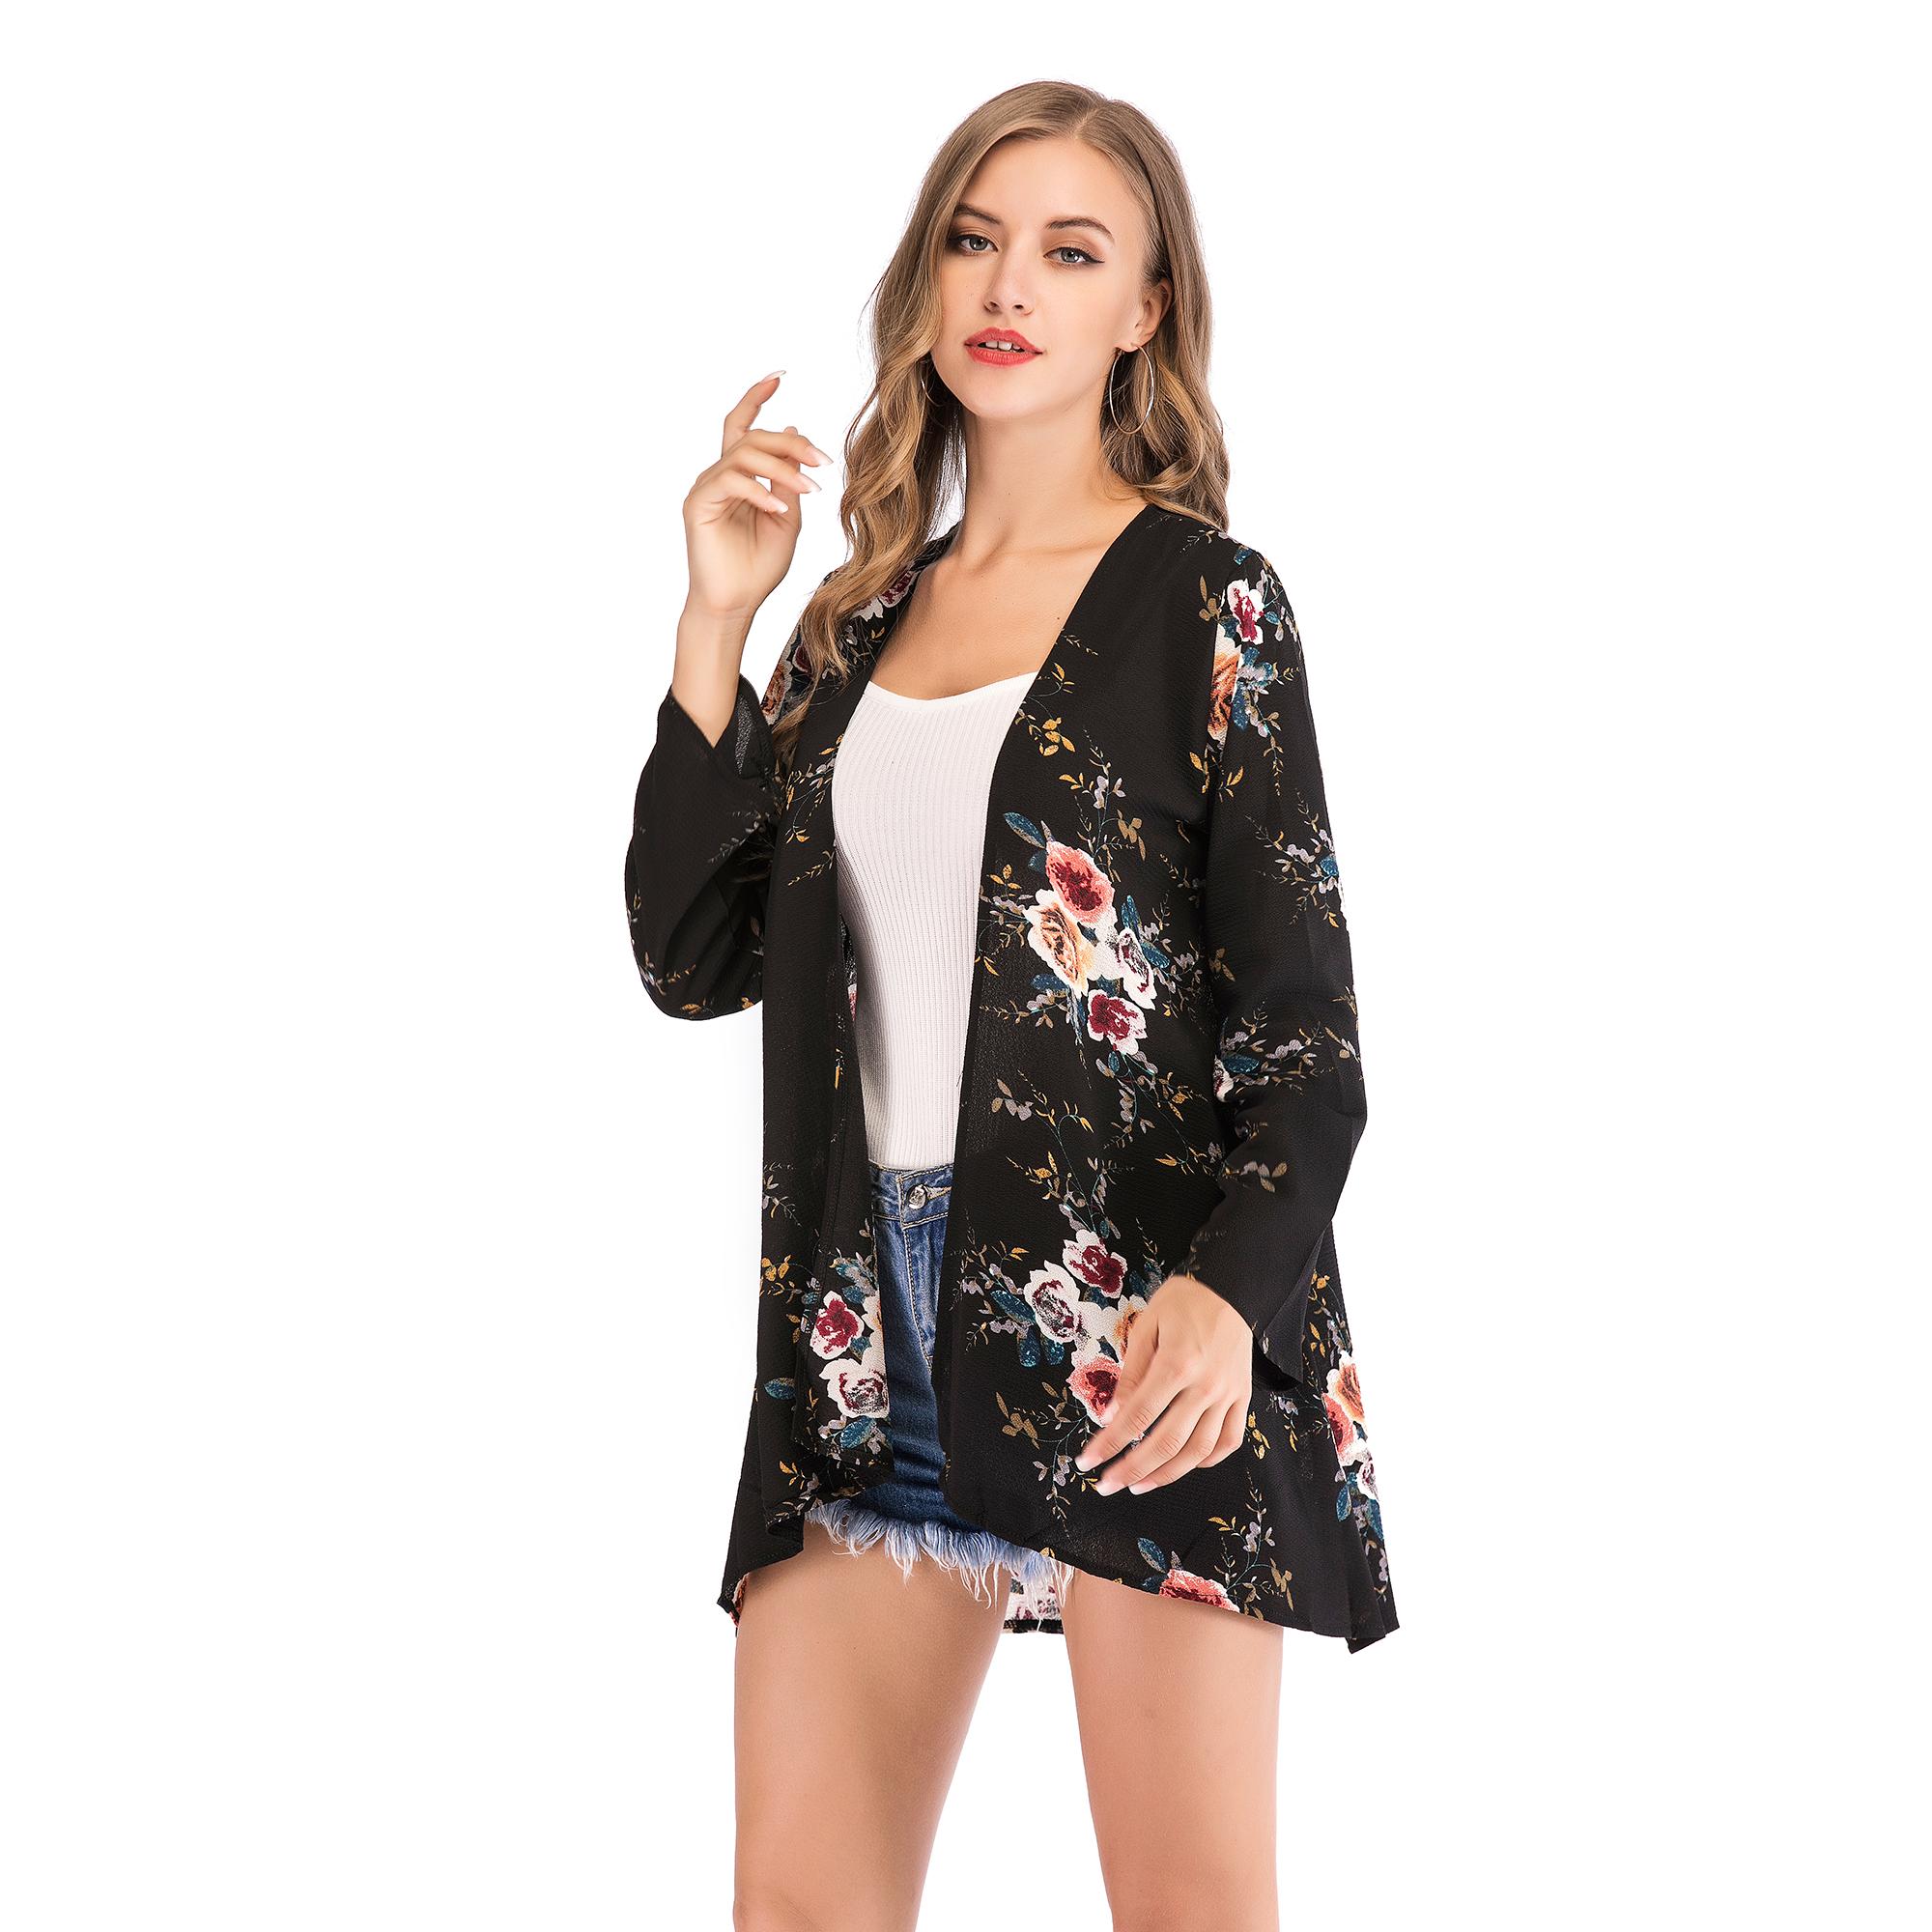 Fashion-Women-Loose-Blouse-Kimono-Cardigan-Tops-Summer-Bikini-Cover-Up-Wrap-Coat thumbnail 18